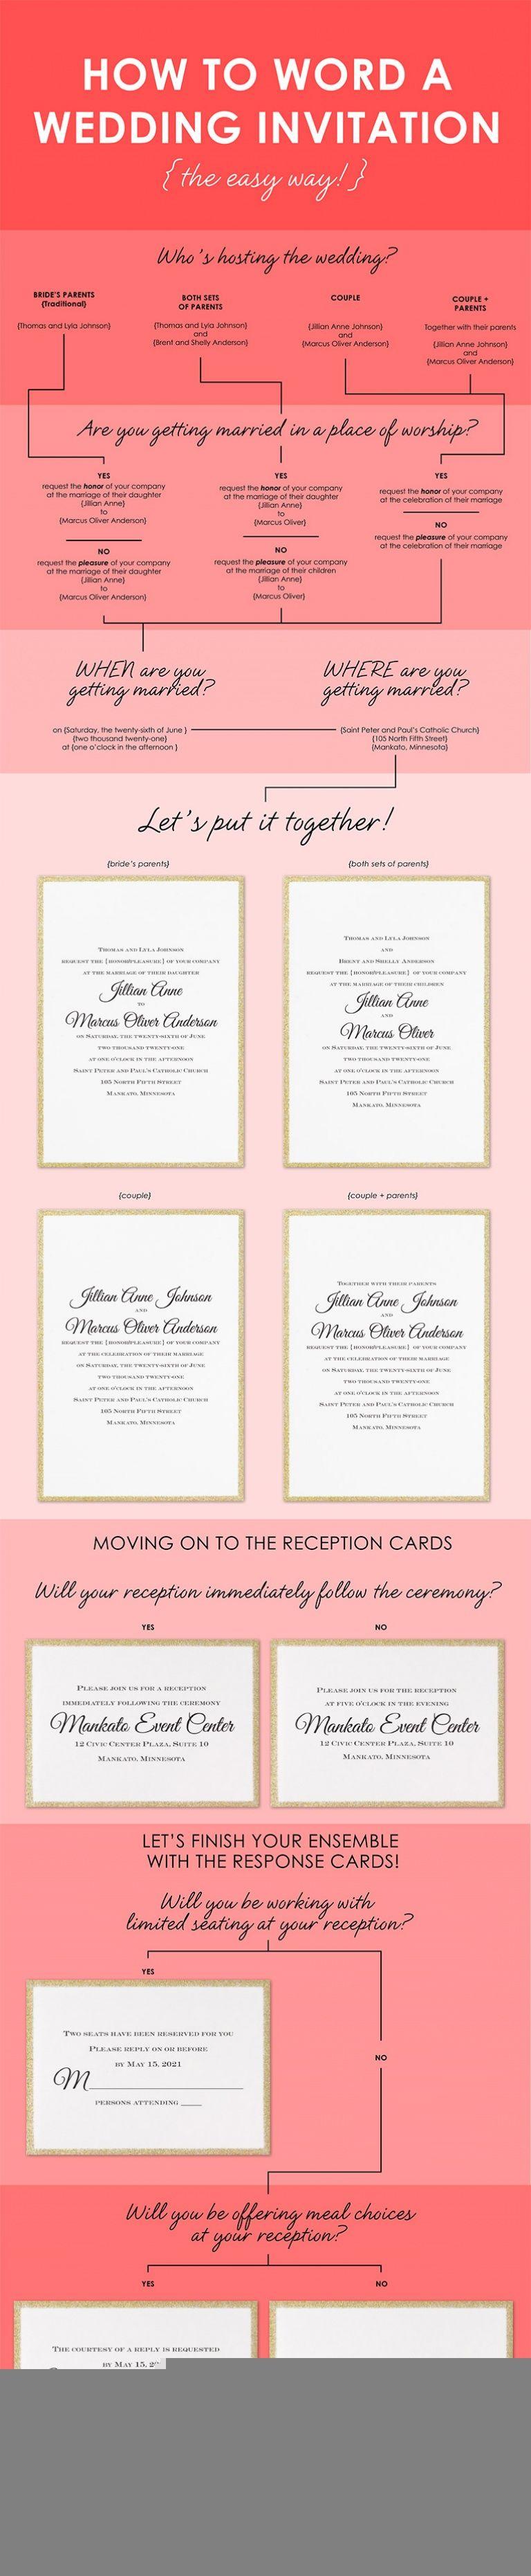 Infographic Wedding Invitation Wording | Invitation | Pinterest ...